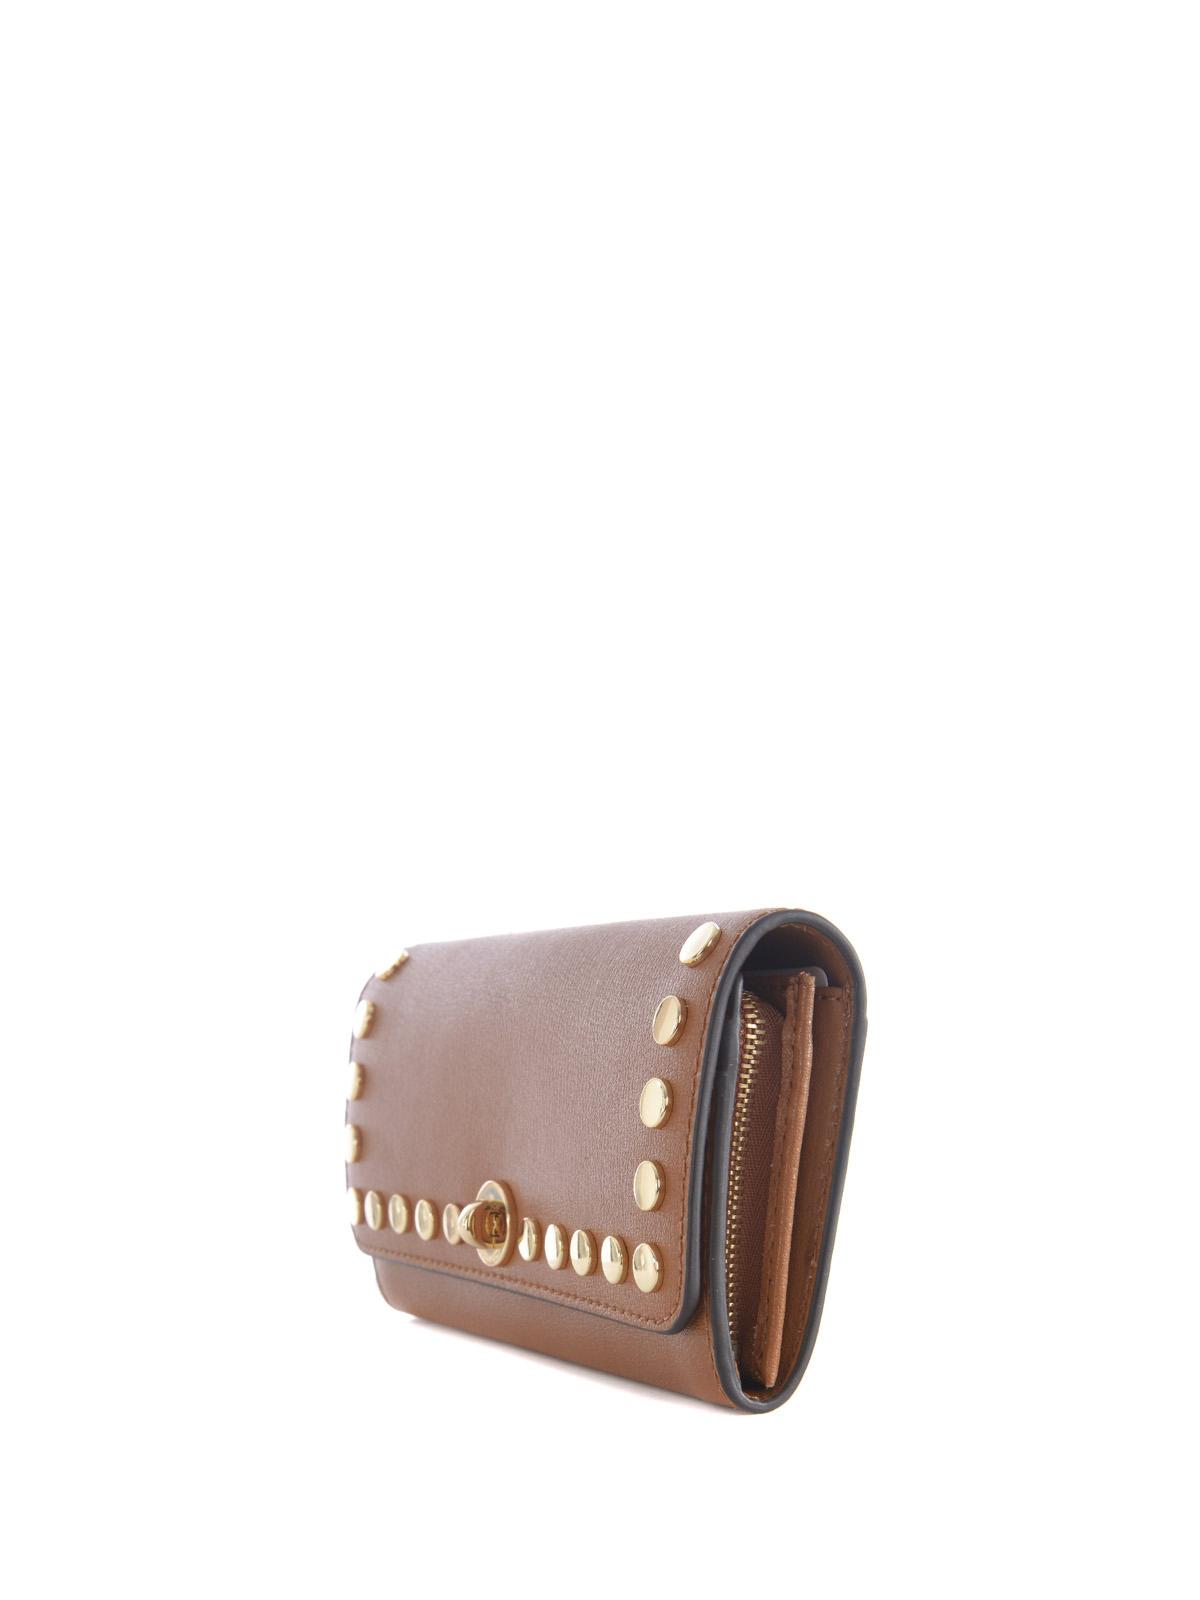 65fb559aaeb6 MICHAEL KORS: wallets & purses online - Rivington Stud leather flap wallet